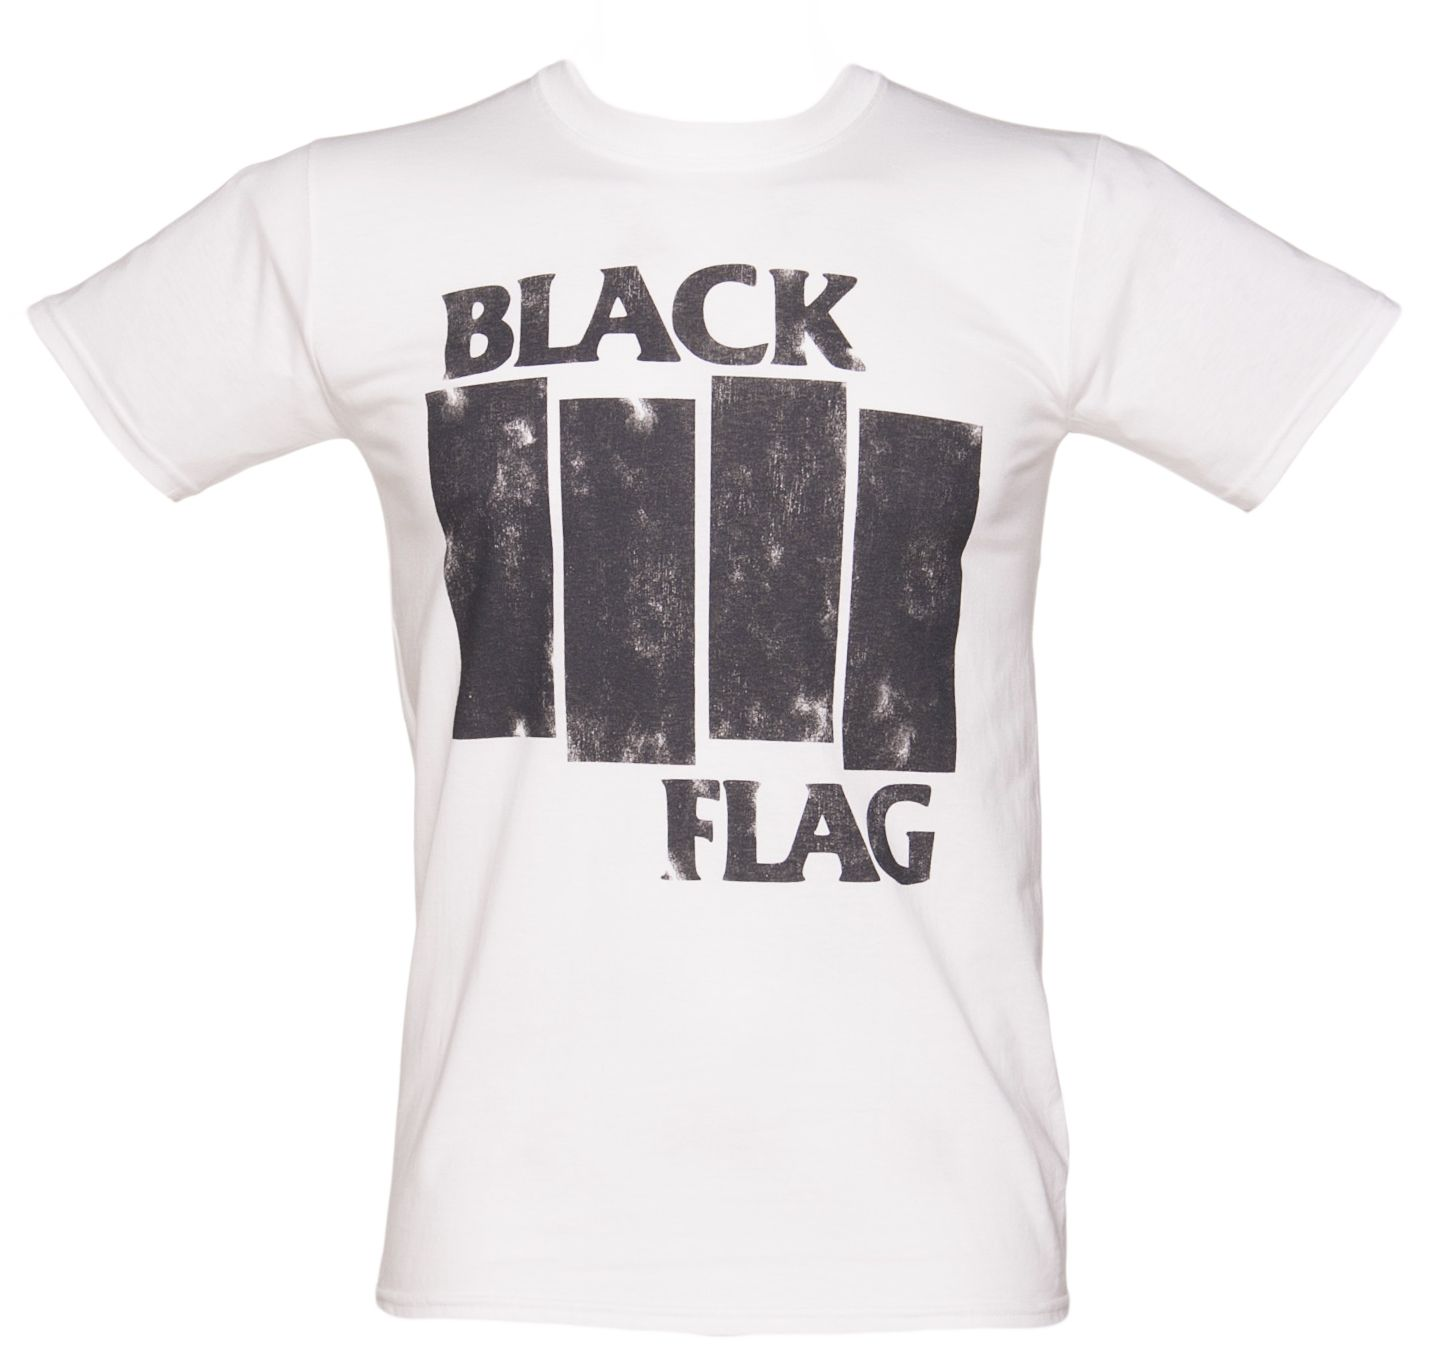 Men s black flag t shirt from truffleshuffle xoxo